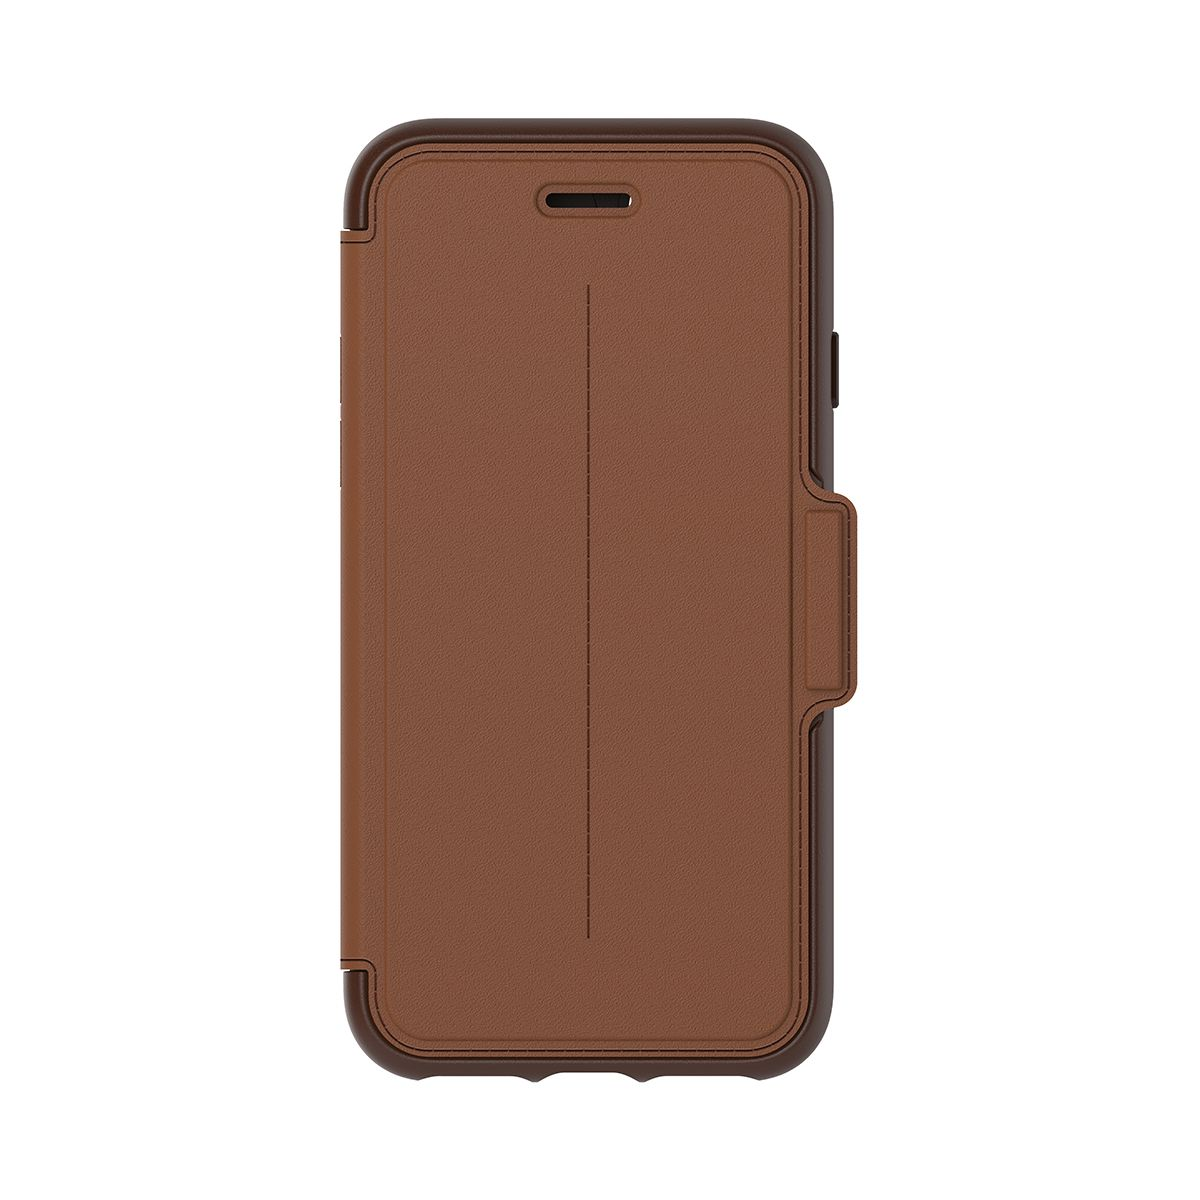 Etui OTTERBOX iPhone 7/8 STRADA cuir marron anti-choc